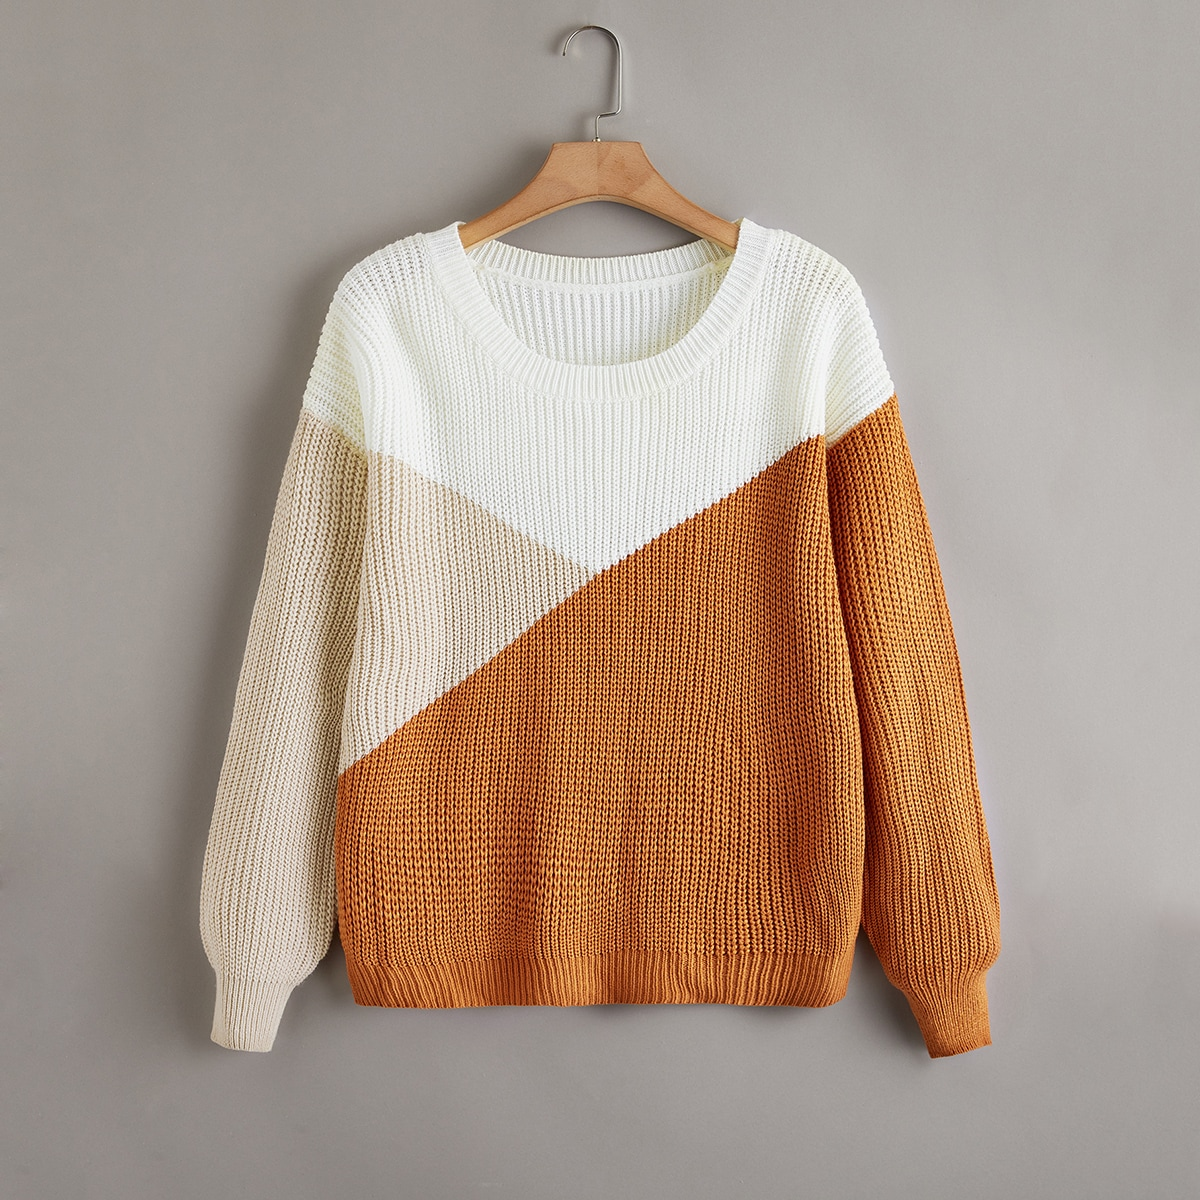 SHEIN Casual Kleurblok Grote maat: trui